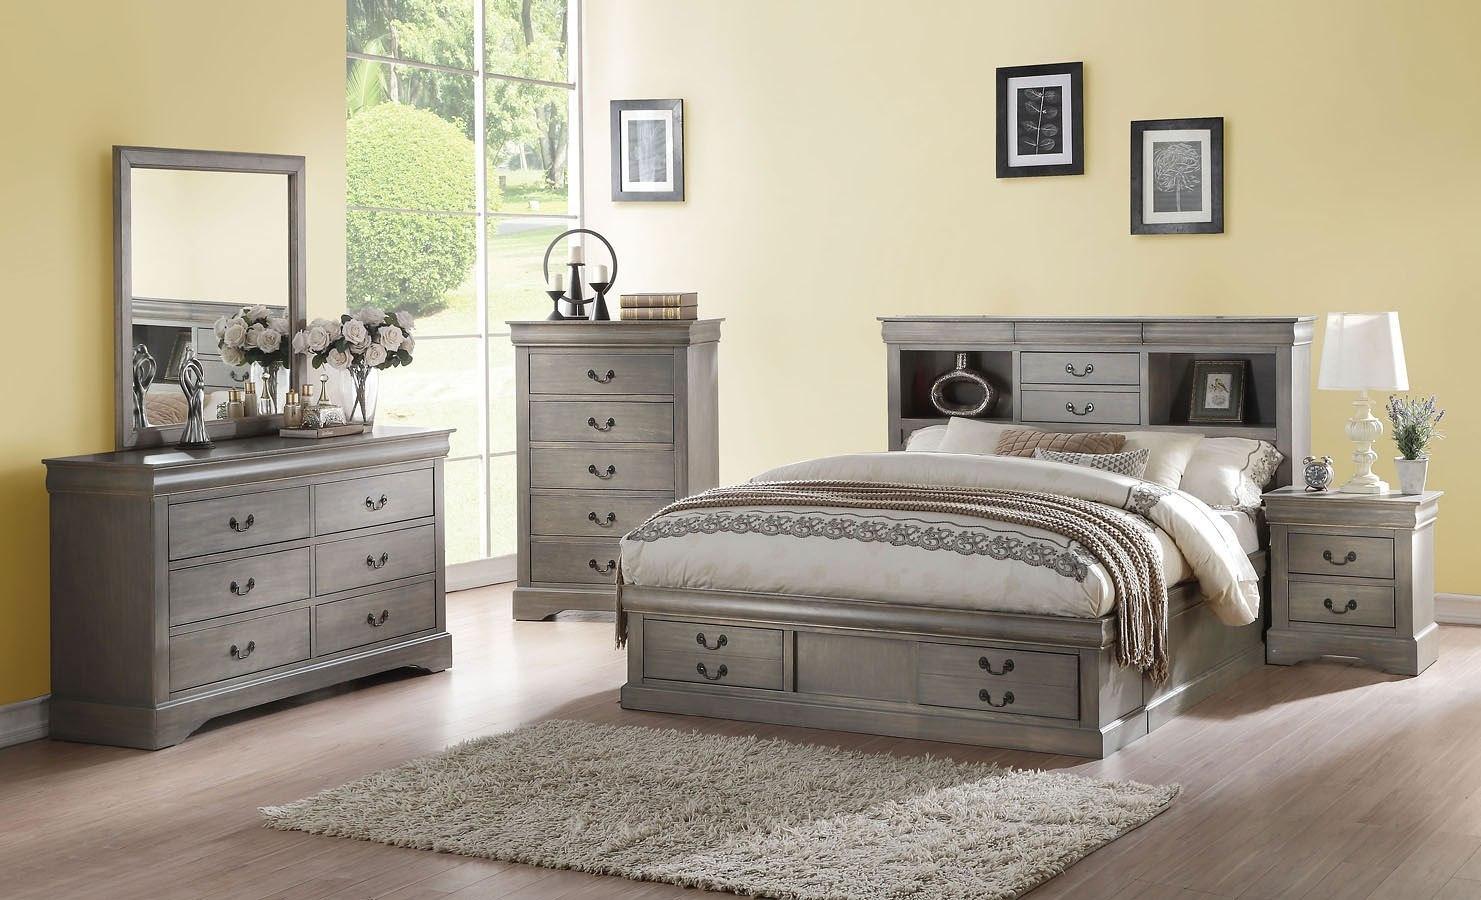 Louis philippe iii bookcase bedroom set antique gray - Louis philippe bedroom collection ...